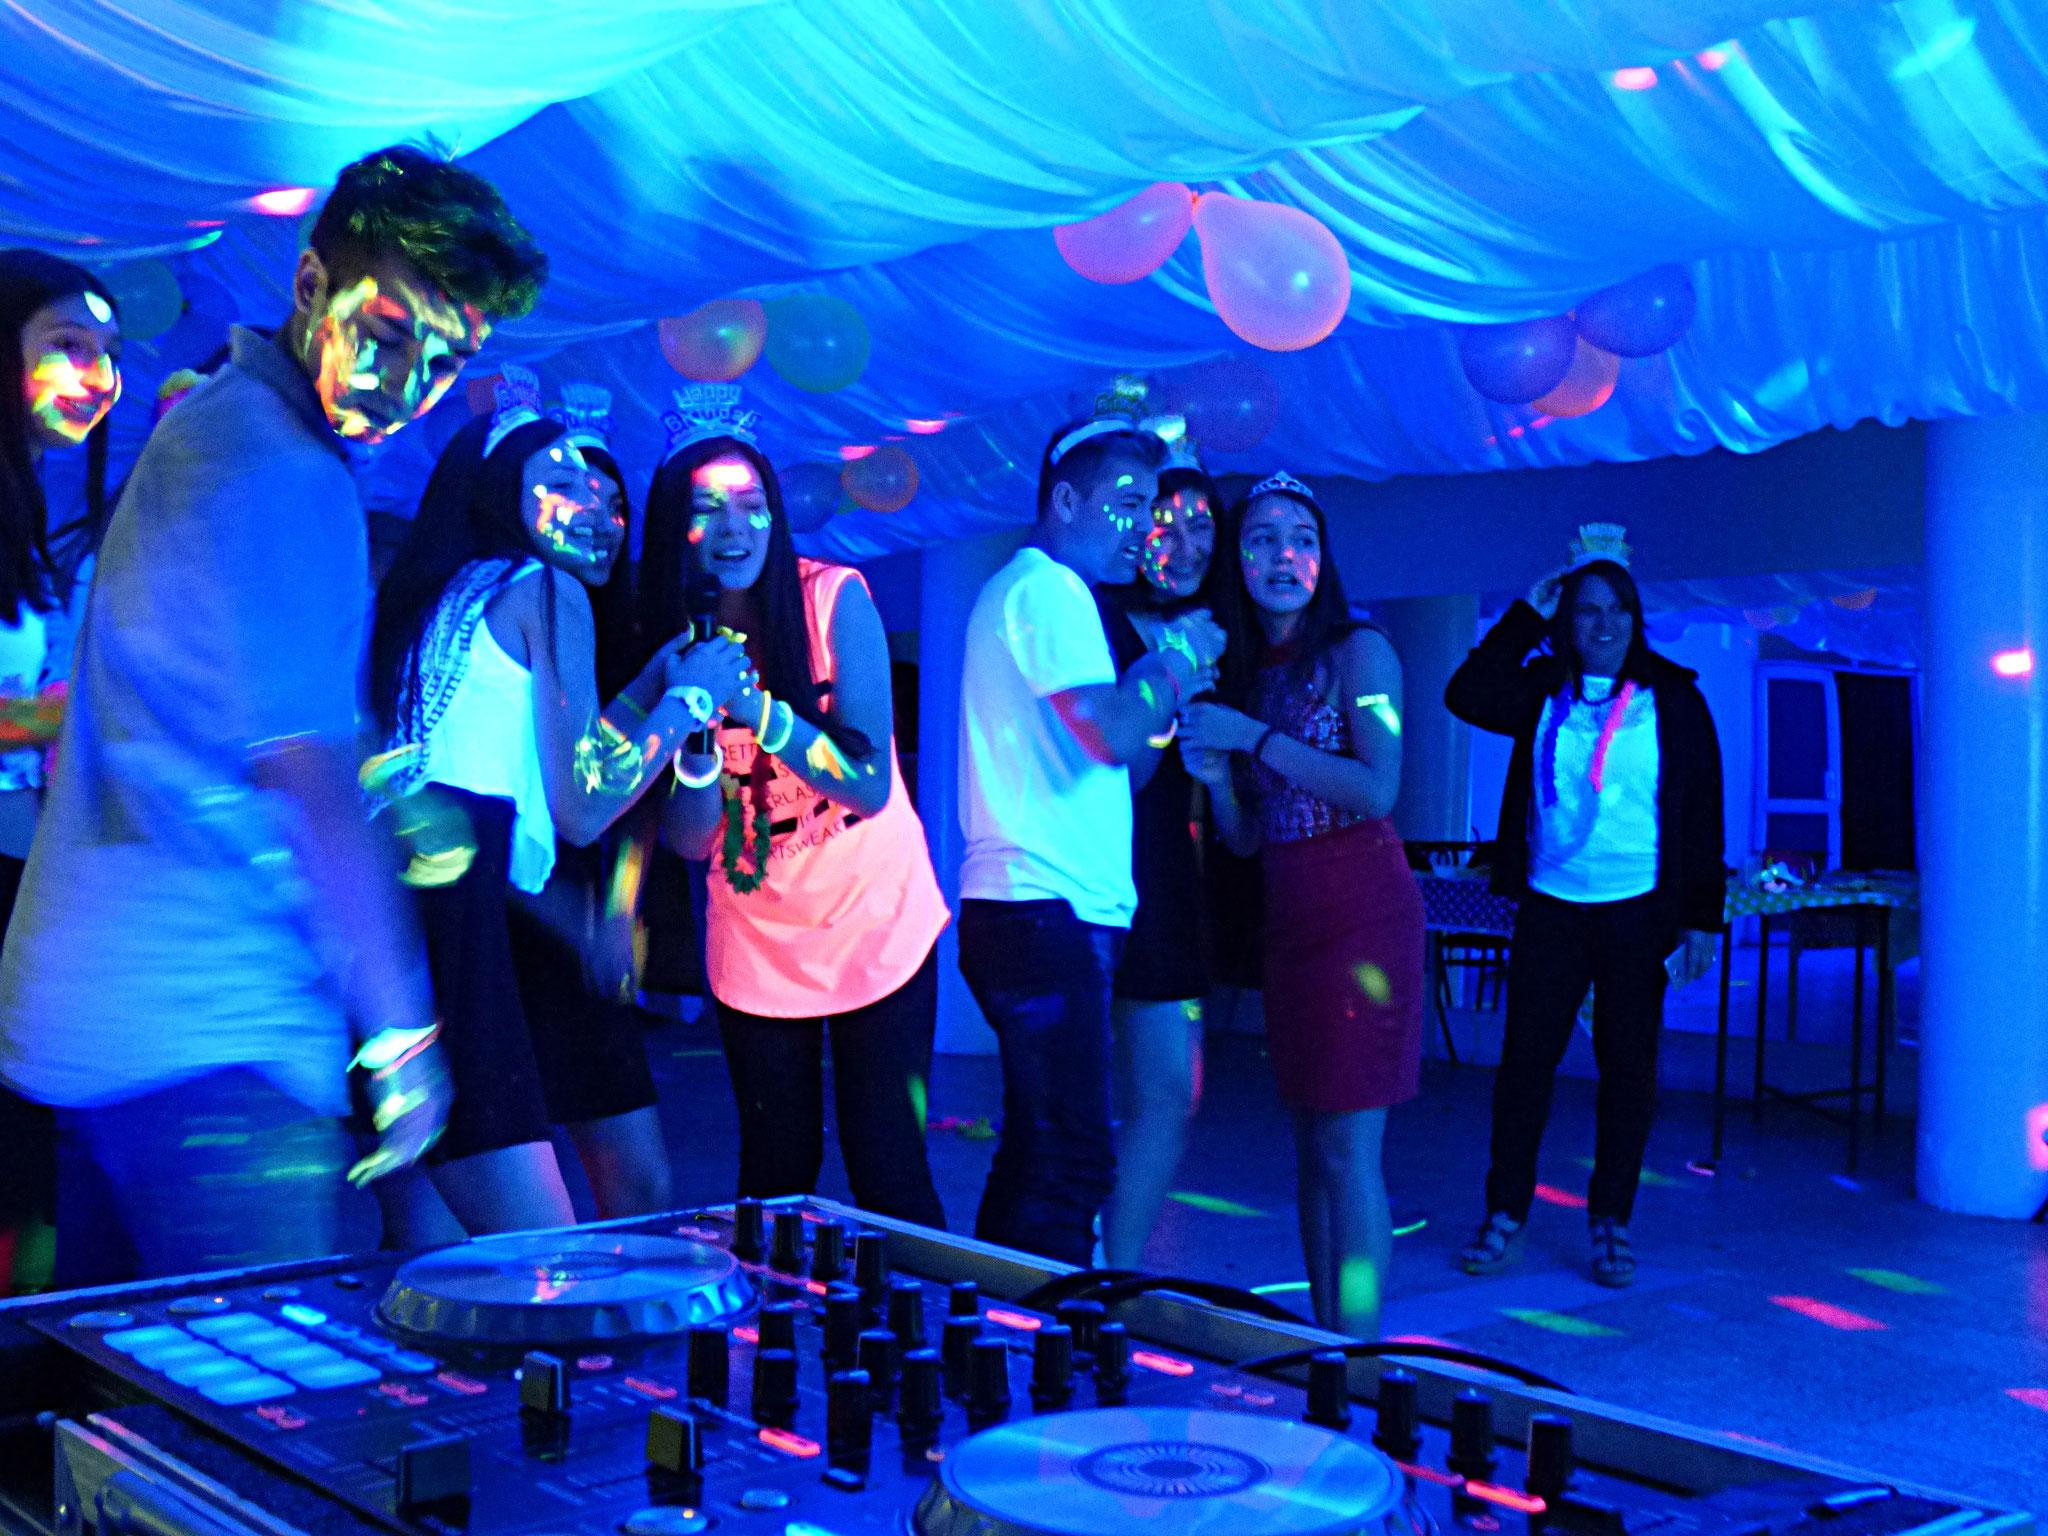 Fiesta de 15 fiesta buenos aires lanus